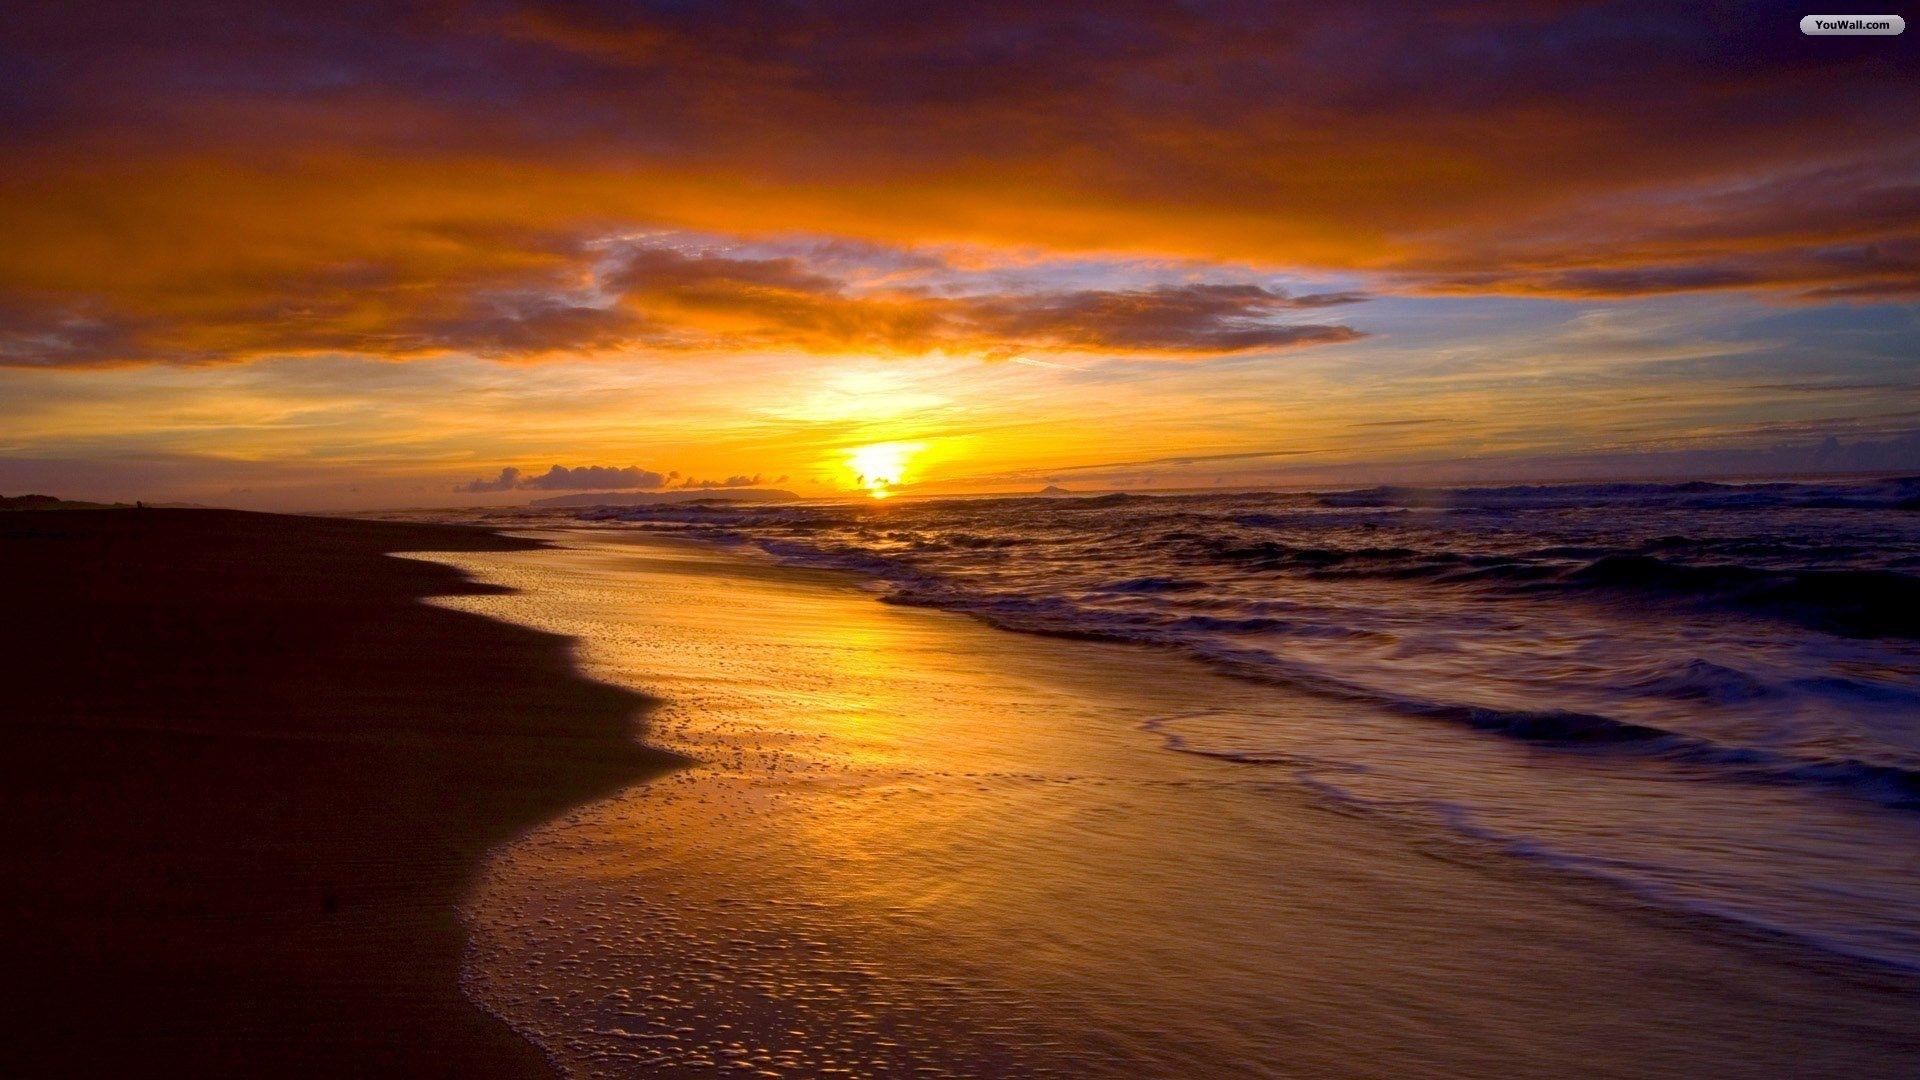 free beach sunset image « long wallpapers